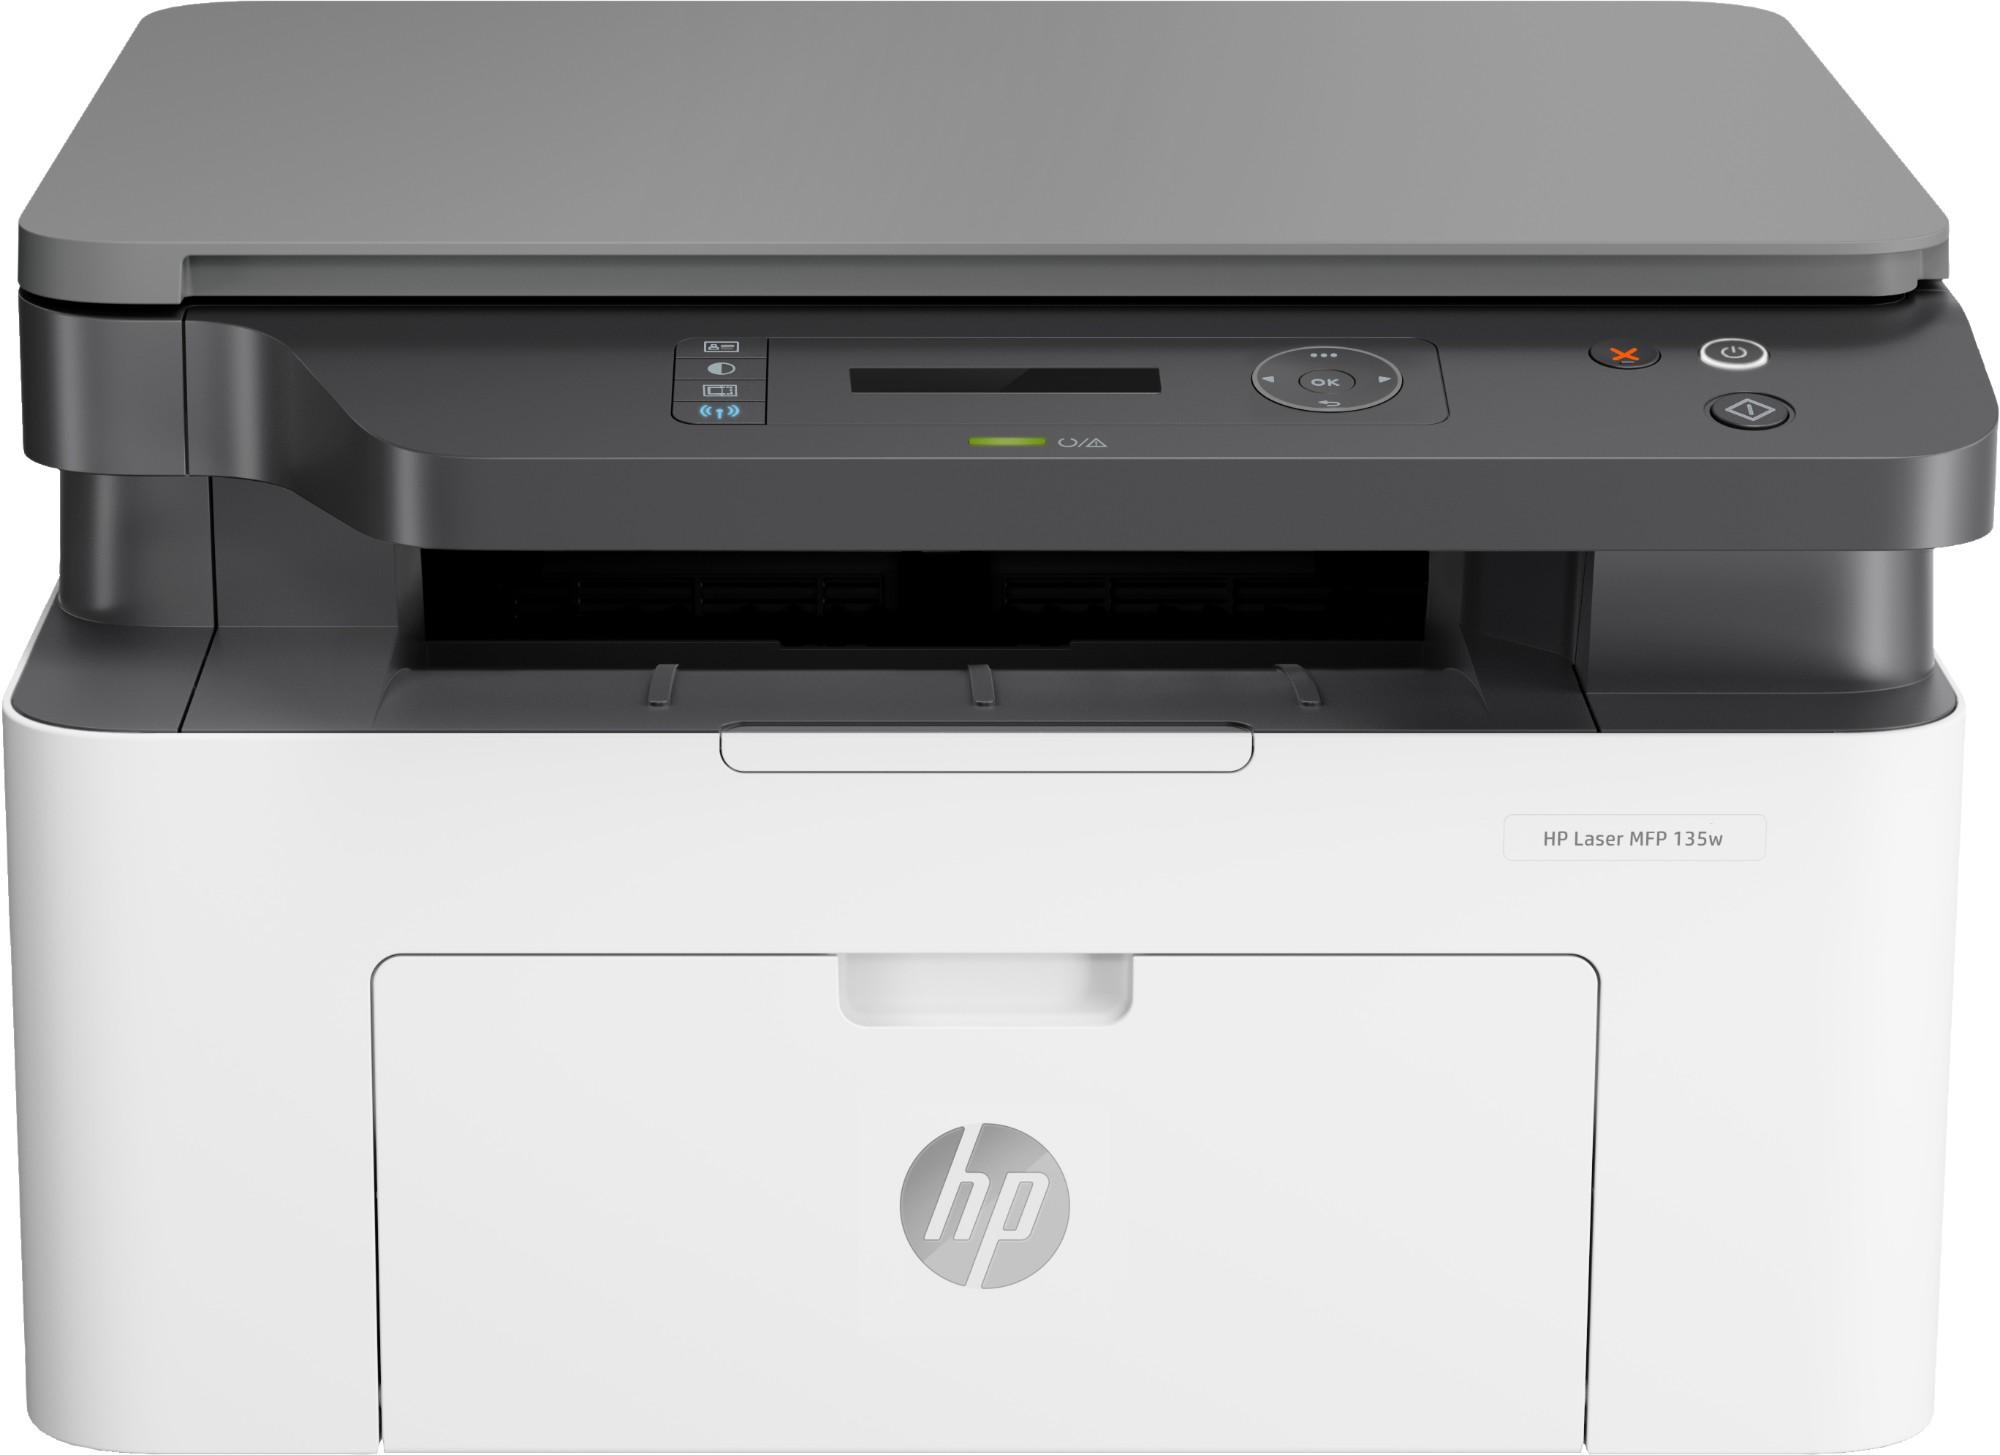 HP Laser 135w A4 1200 x 1200 DPI 20 ppm Wi-Fi